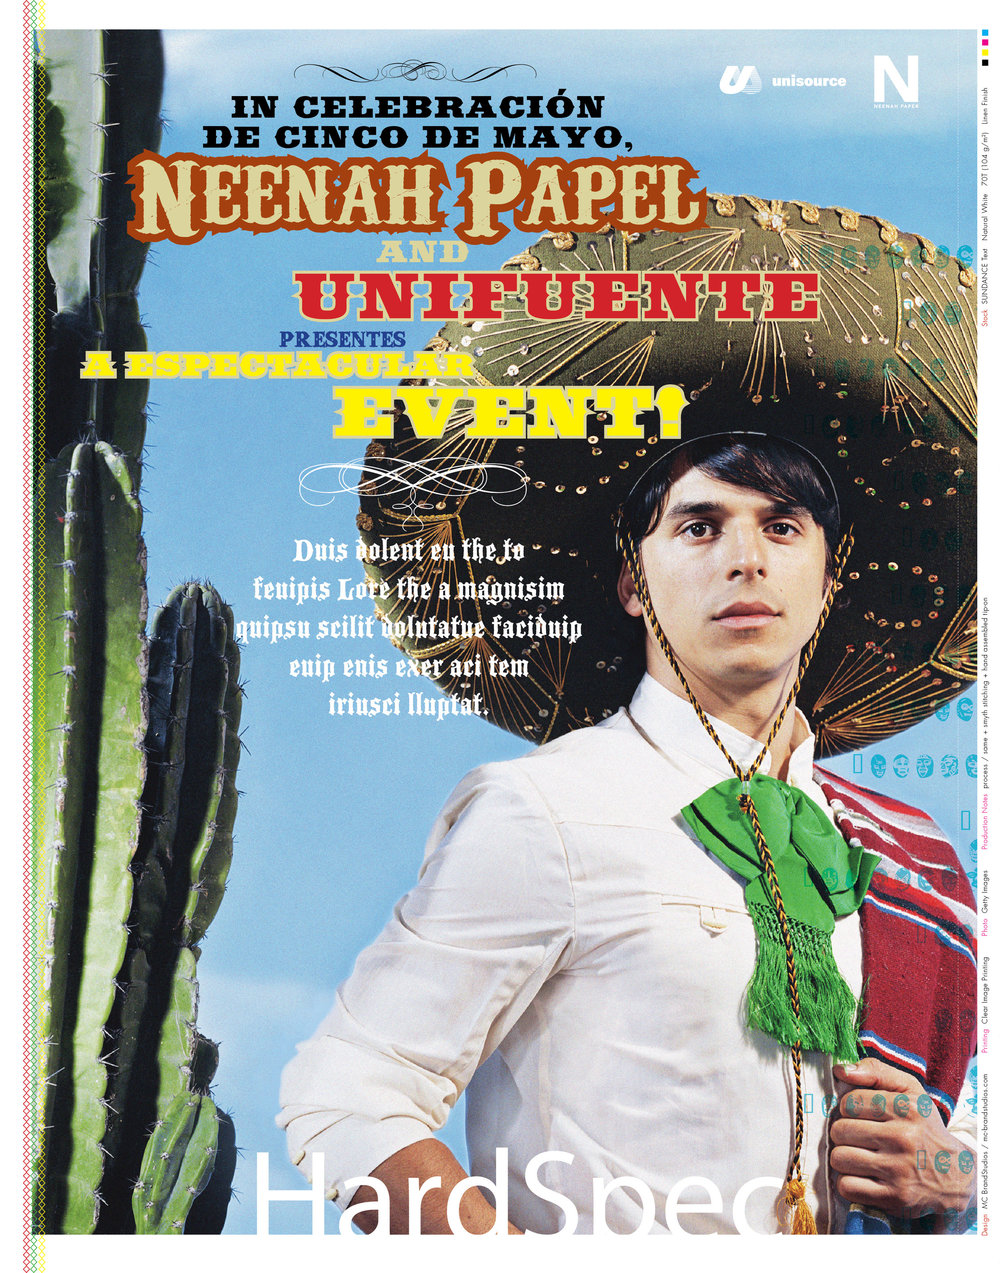 Unisource Worldwide / Neenah Paper